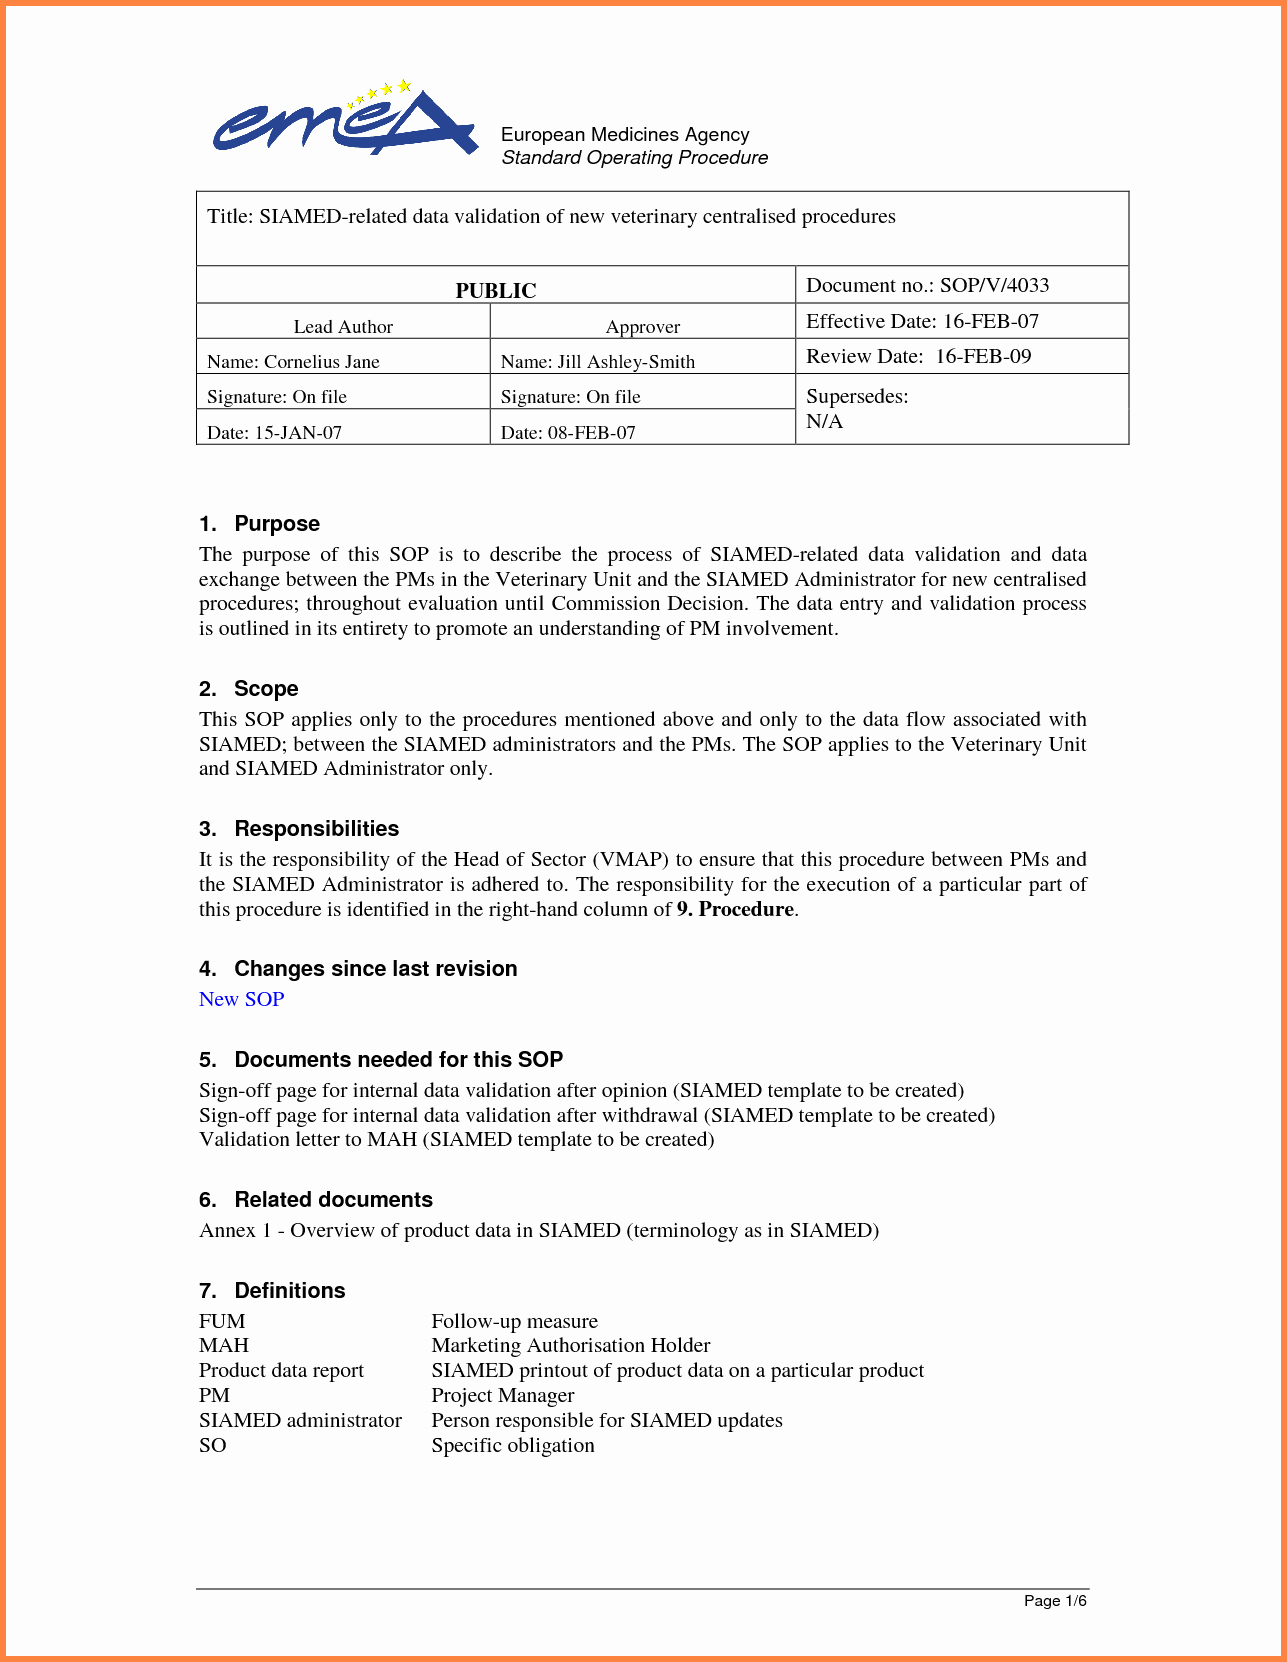 Standard Operating Procedures Template Free Best Of Template for sop Portablegasgrillweber